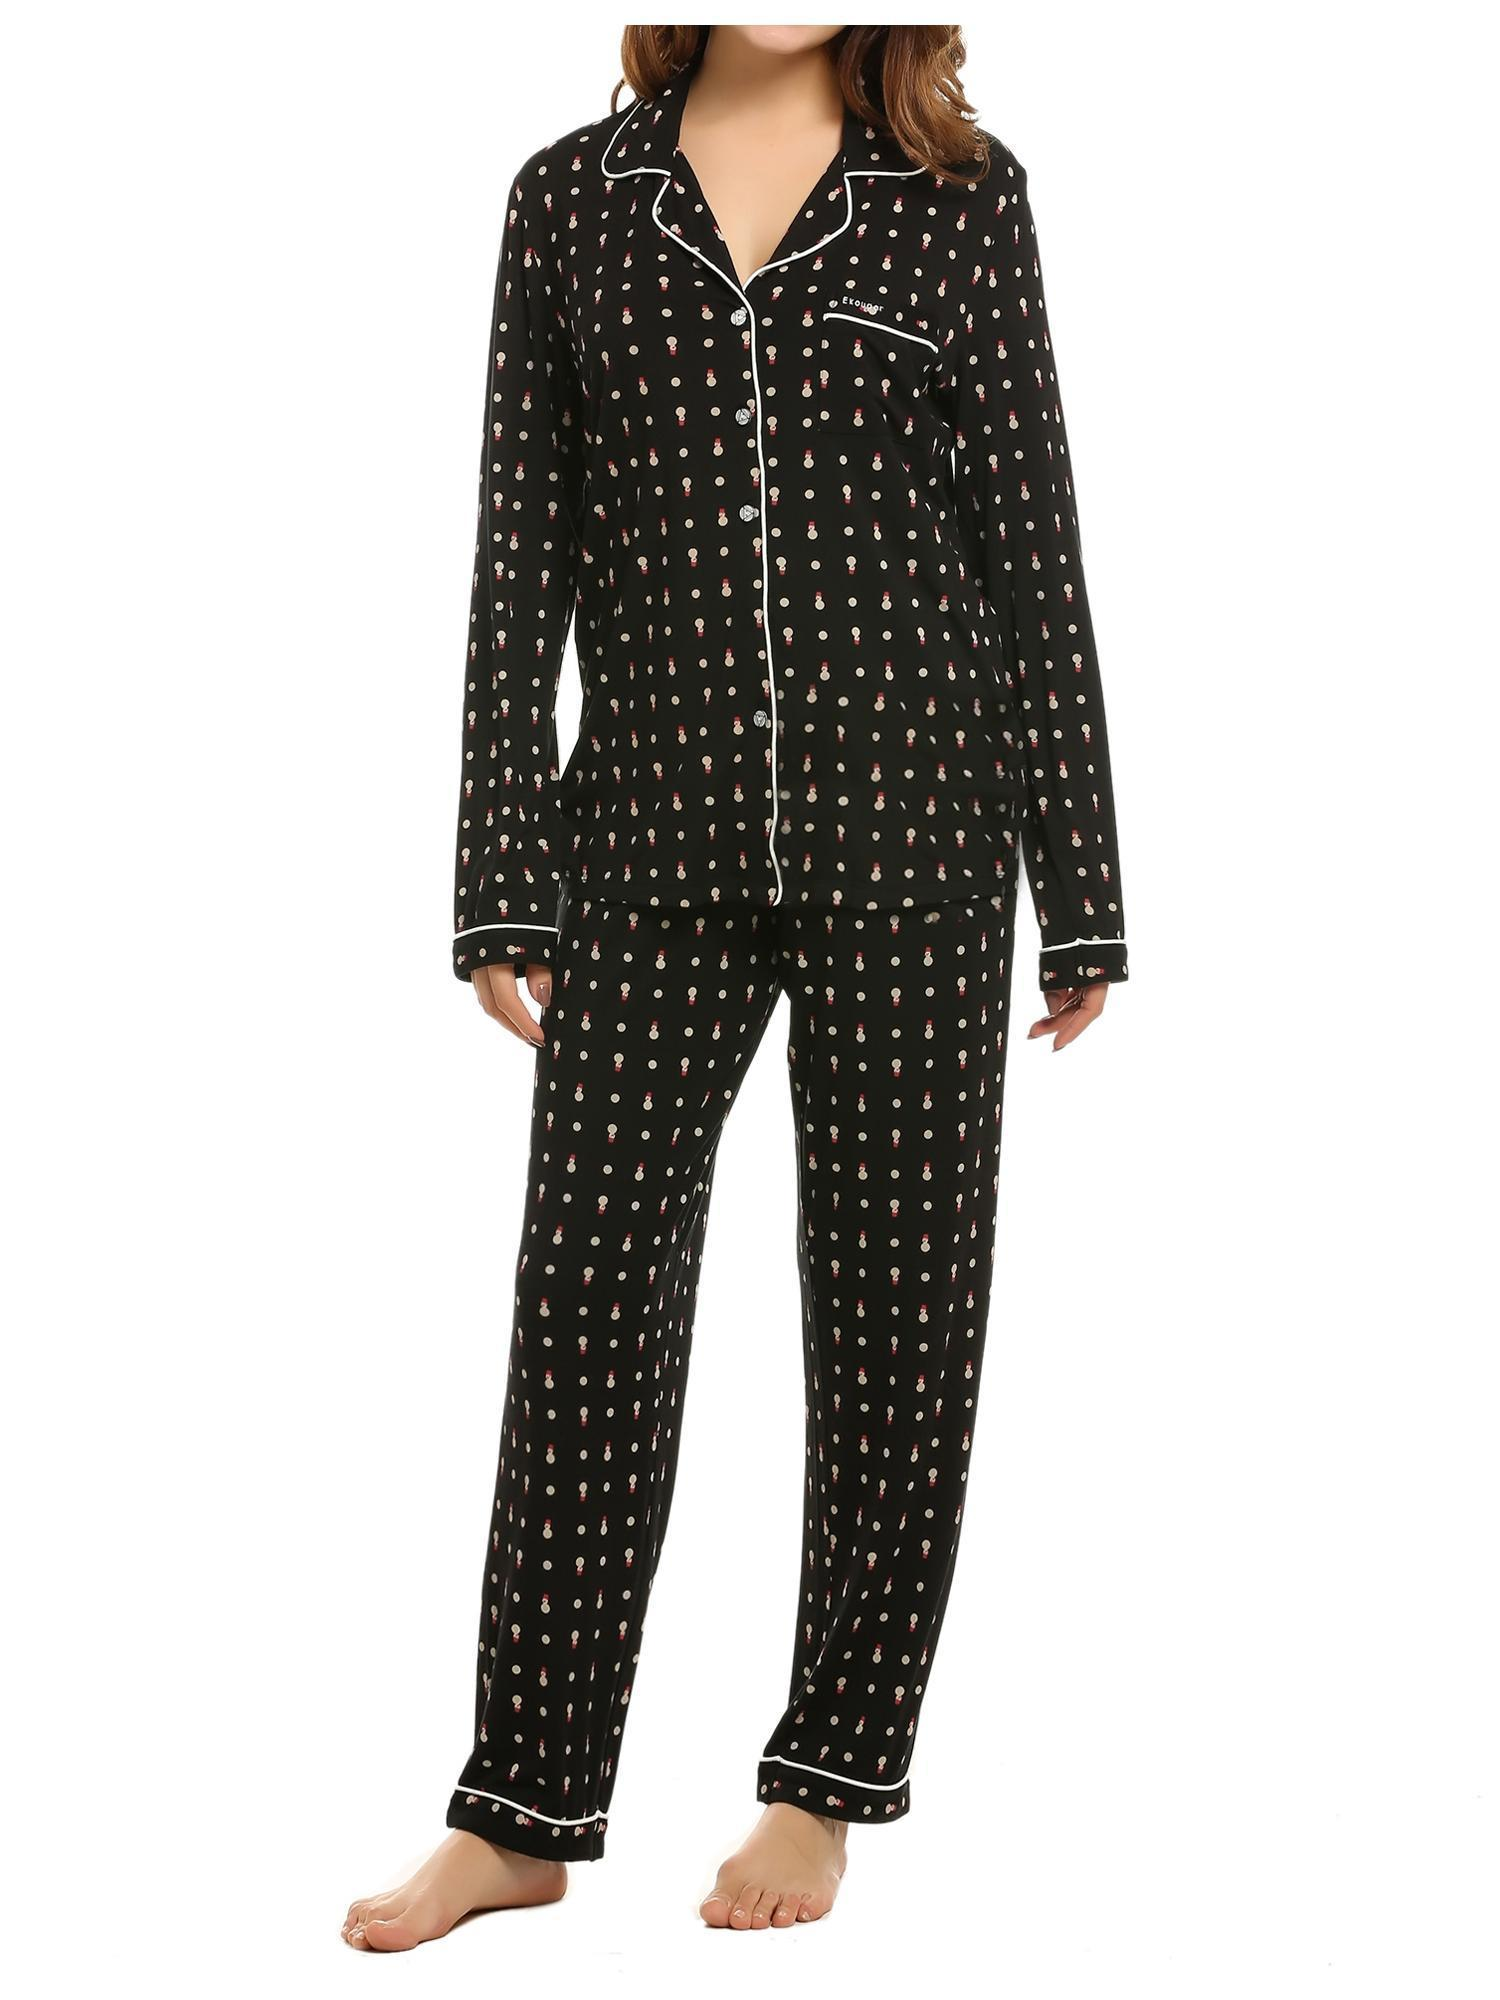 3b45da403c Ekouaer Women Sleepwear 2 Piece Shirt Long Pajama Set cbst - Walmart.com